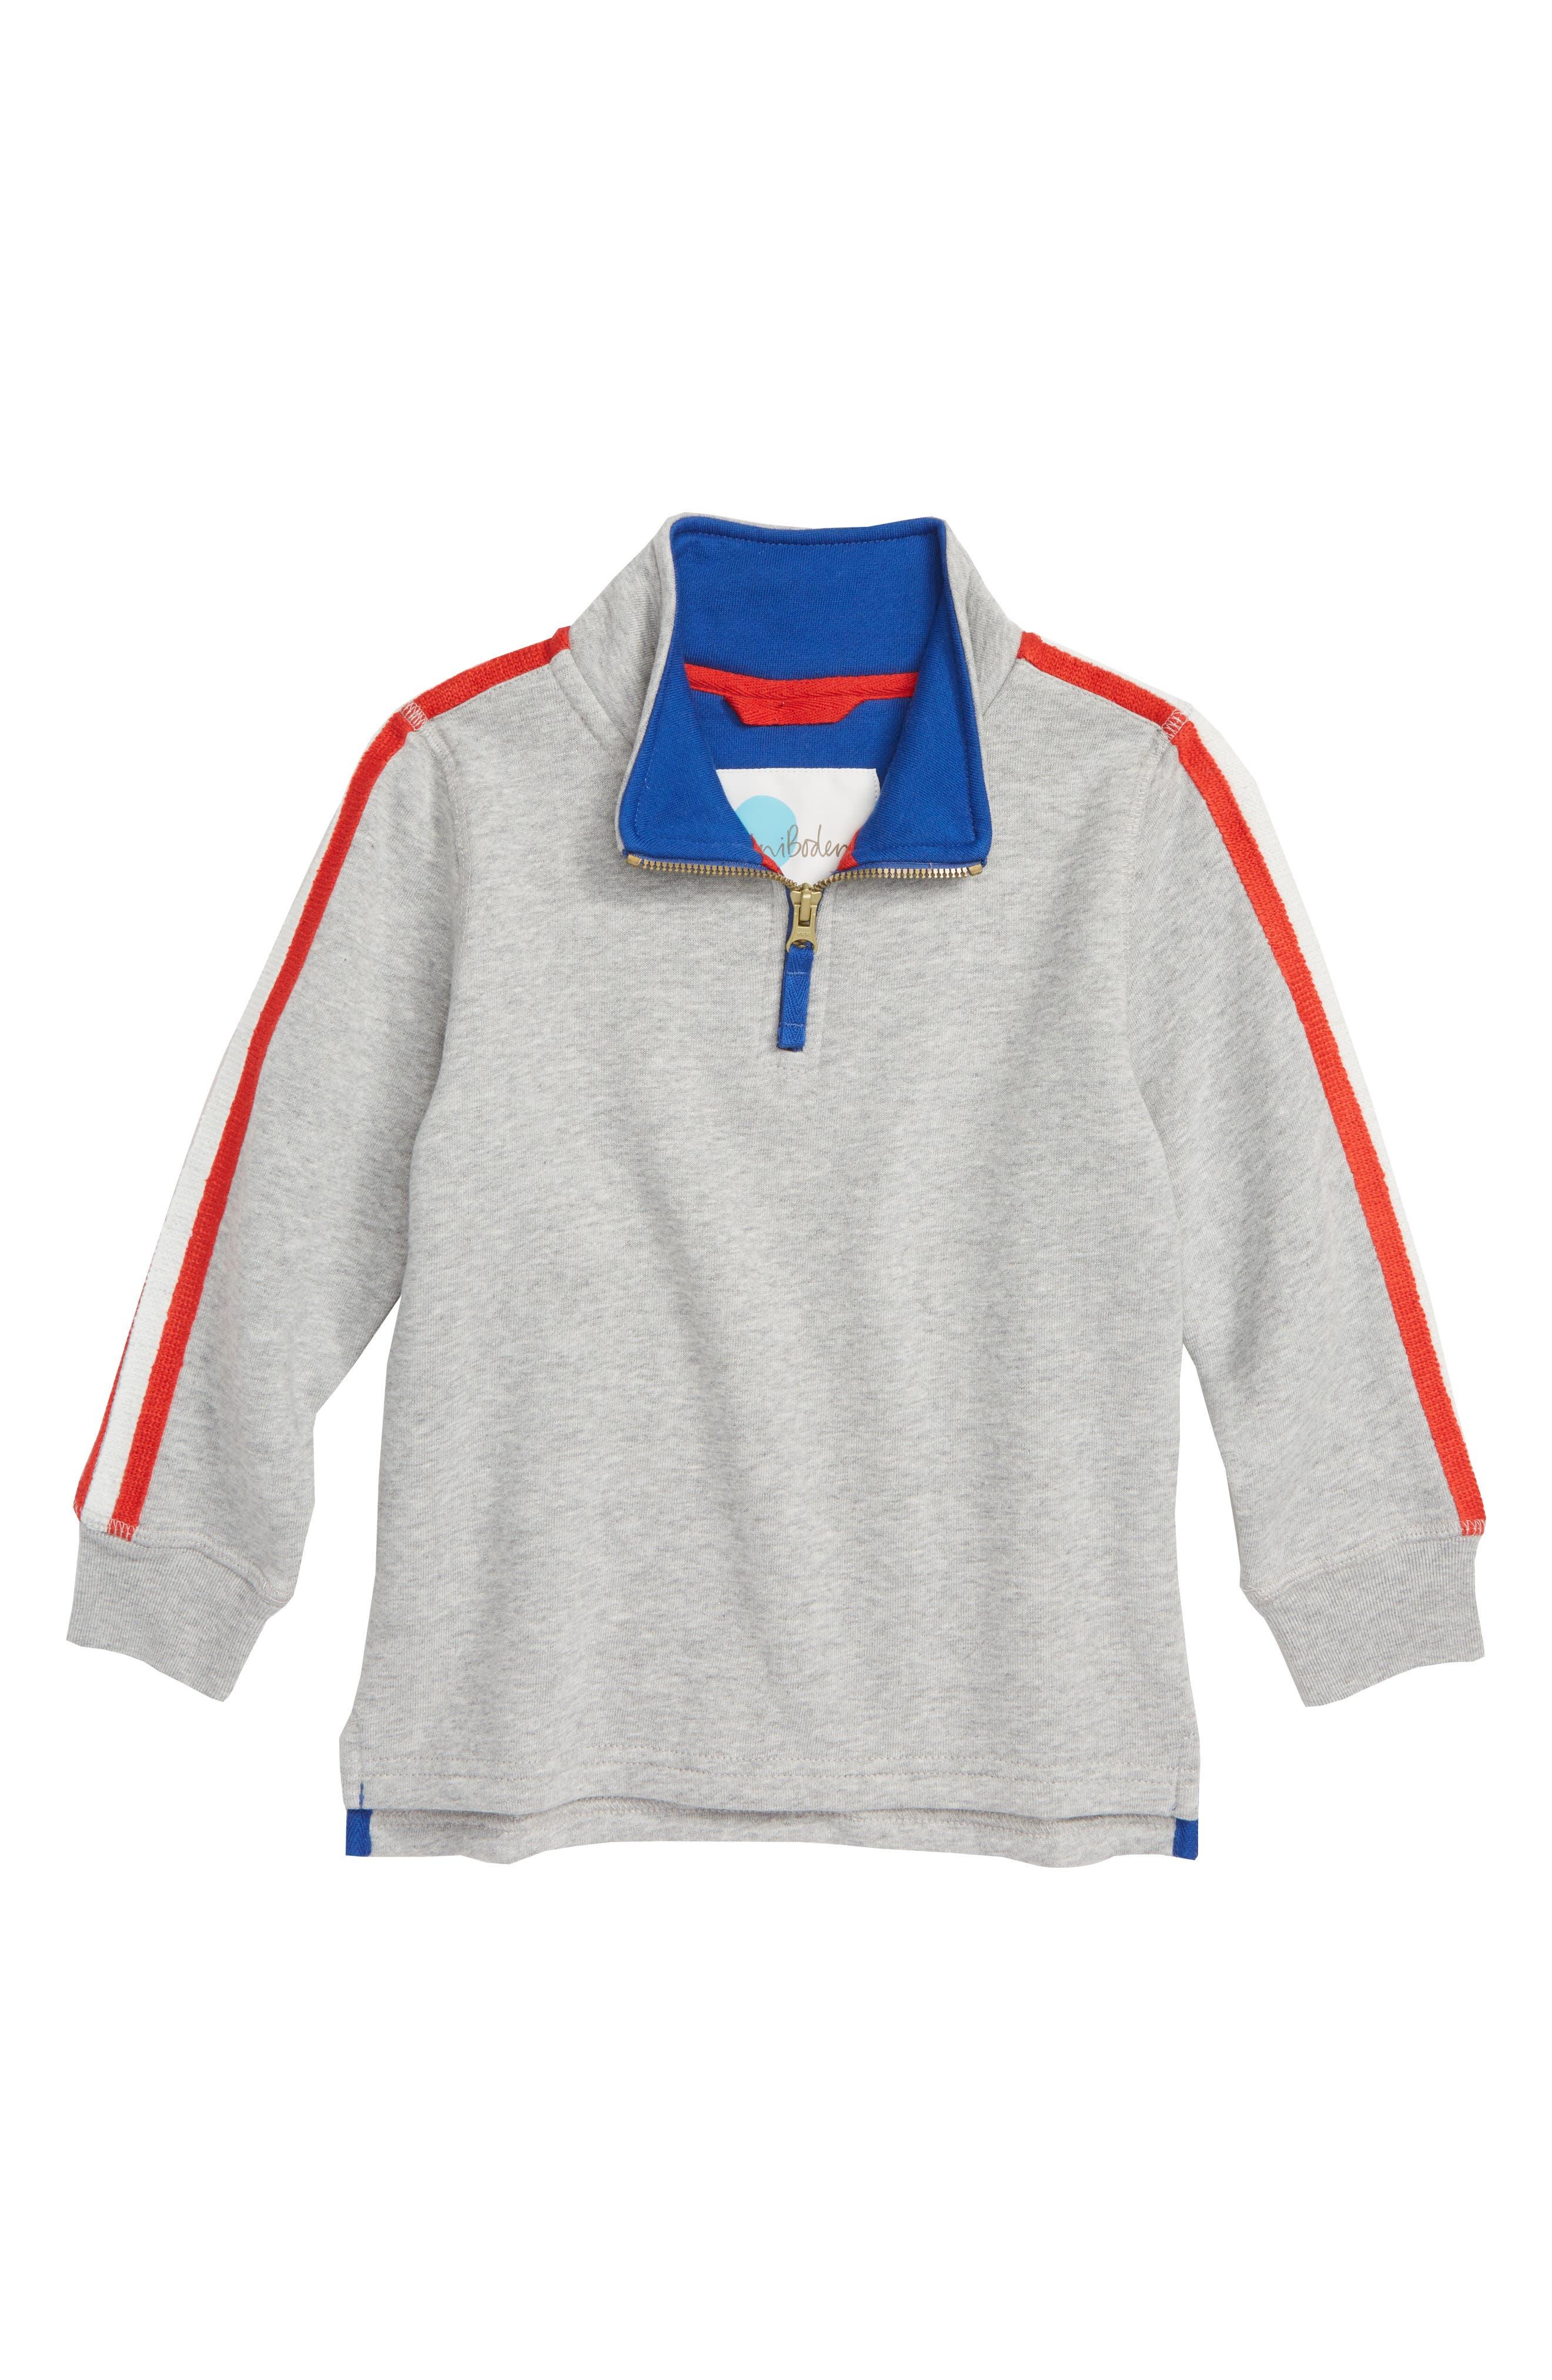 Half Zip Pullover,                             Main thumbnail 1, color,                             GREY MARL JASPE